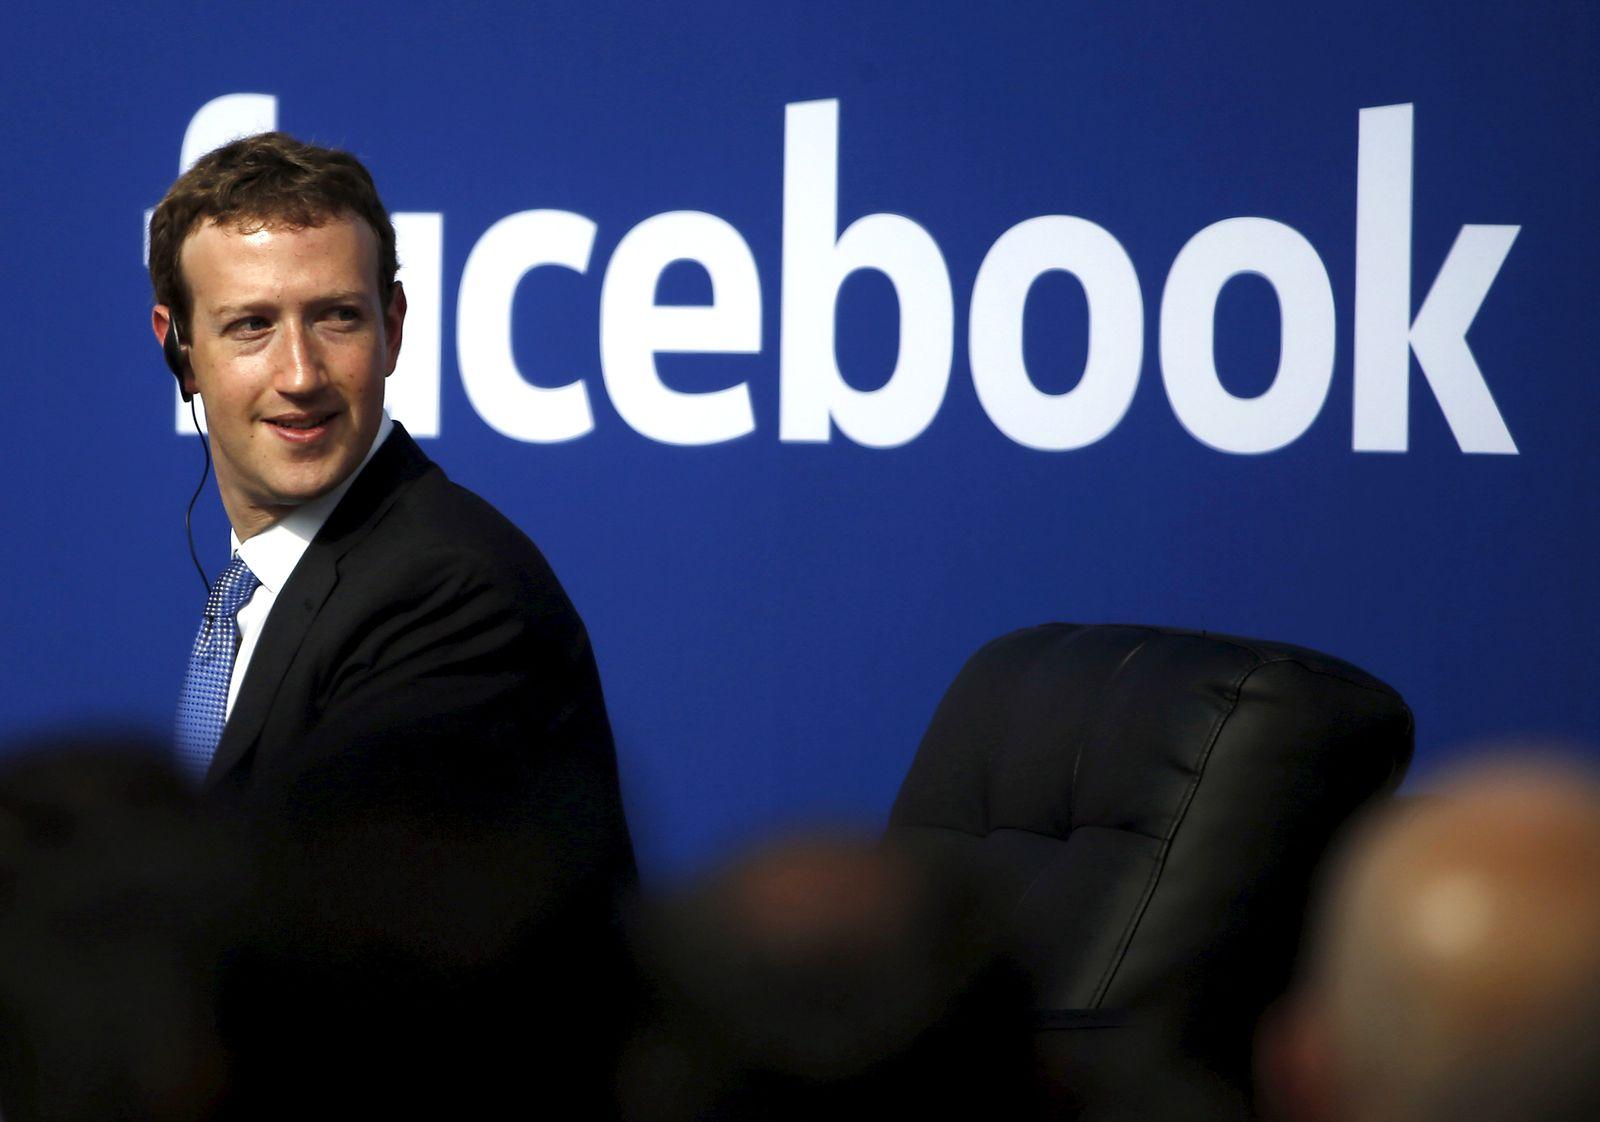 Facebook/ Zuckerberg